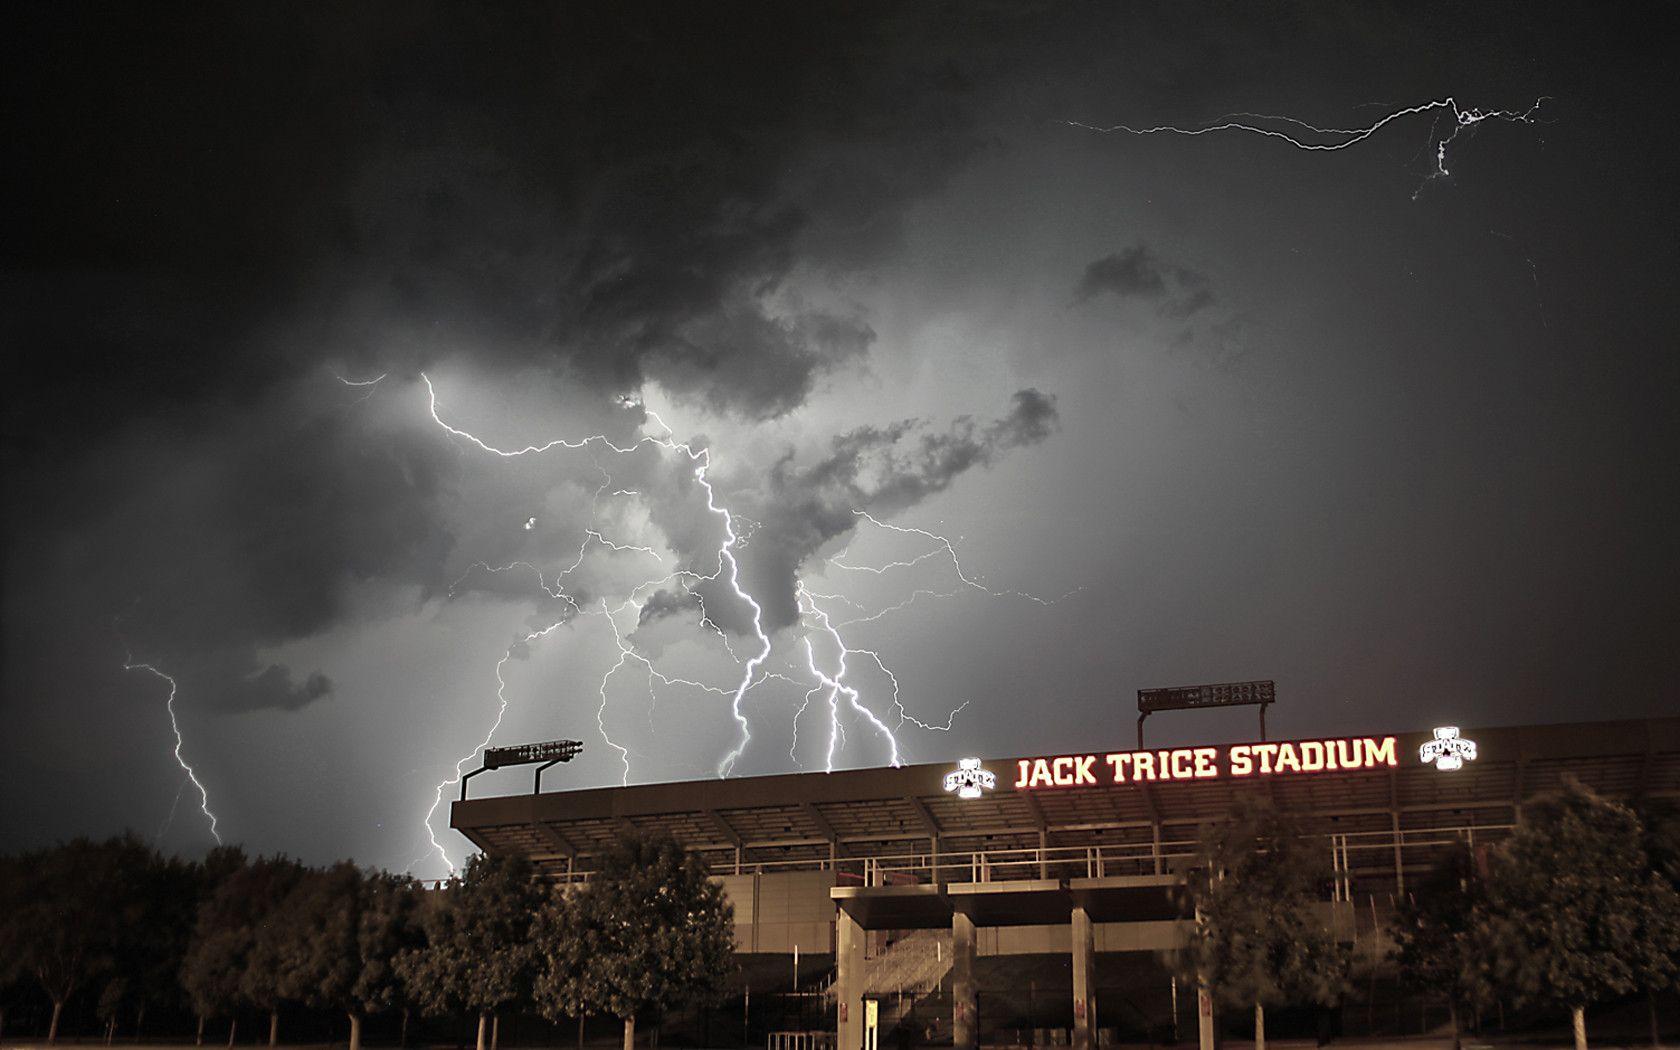 Jack Trice Stadium Love Iowa State Football Iowa State Cyclones Football Iowa State Cyclones